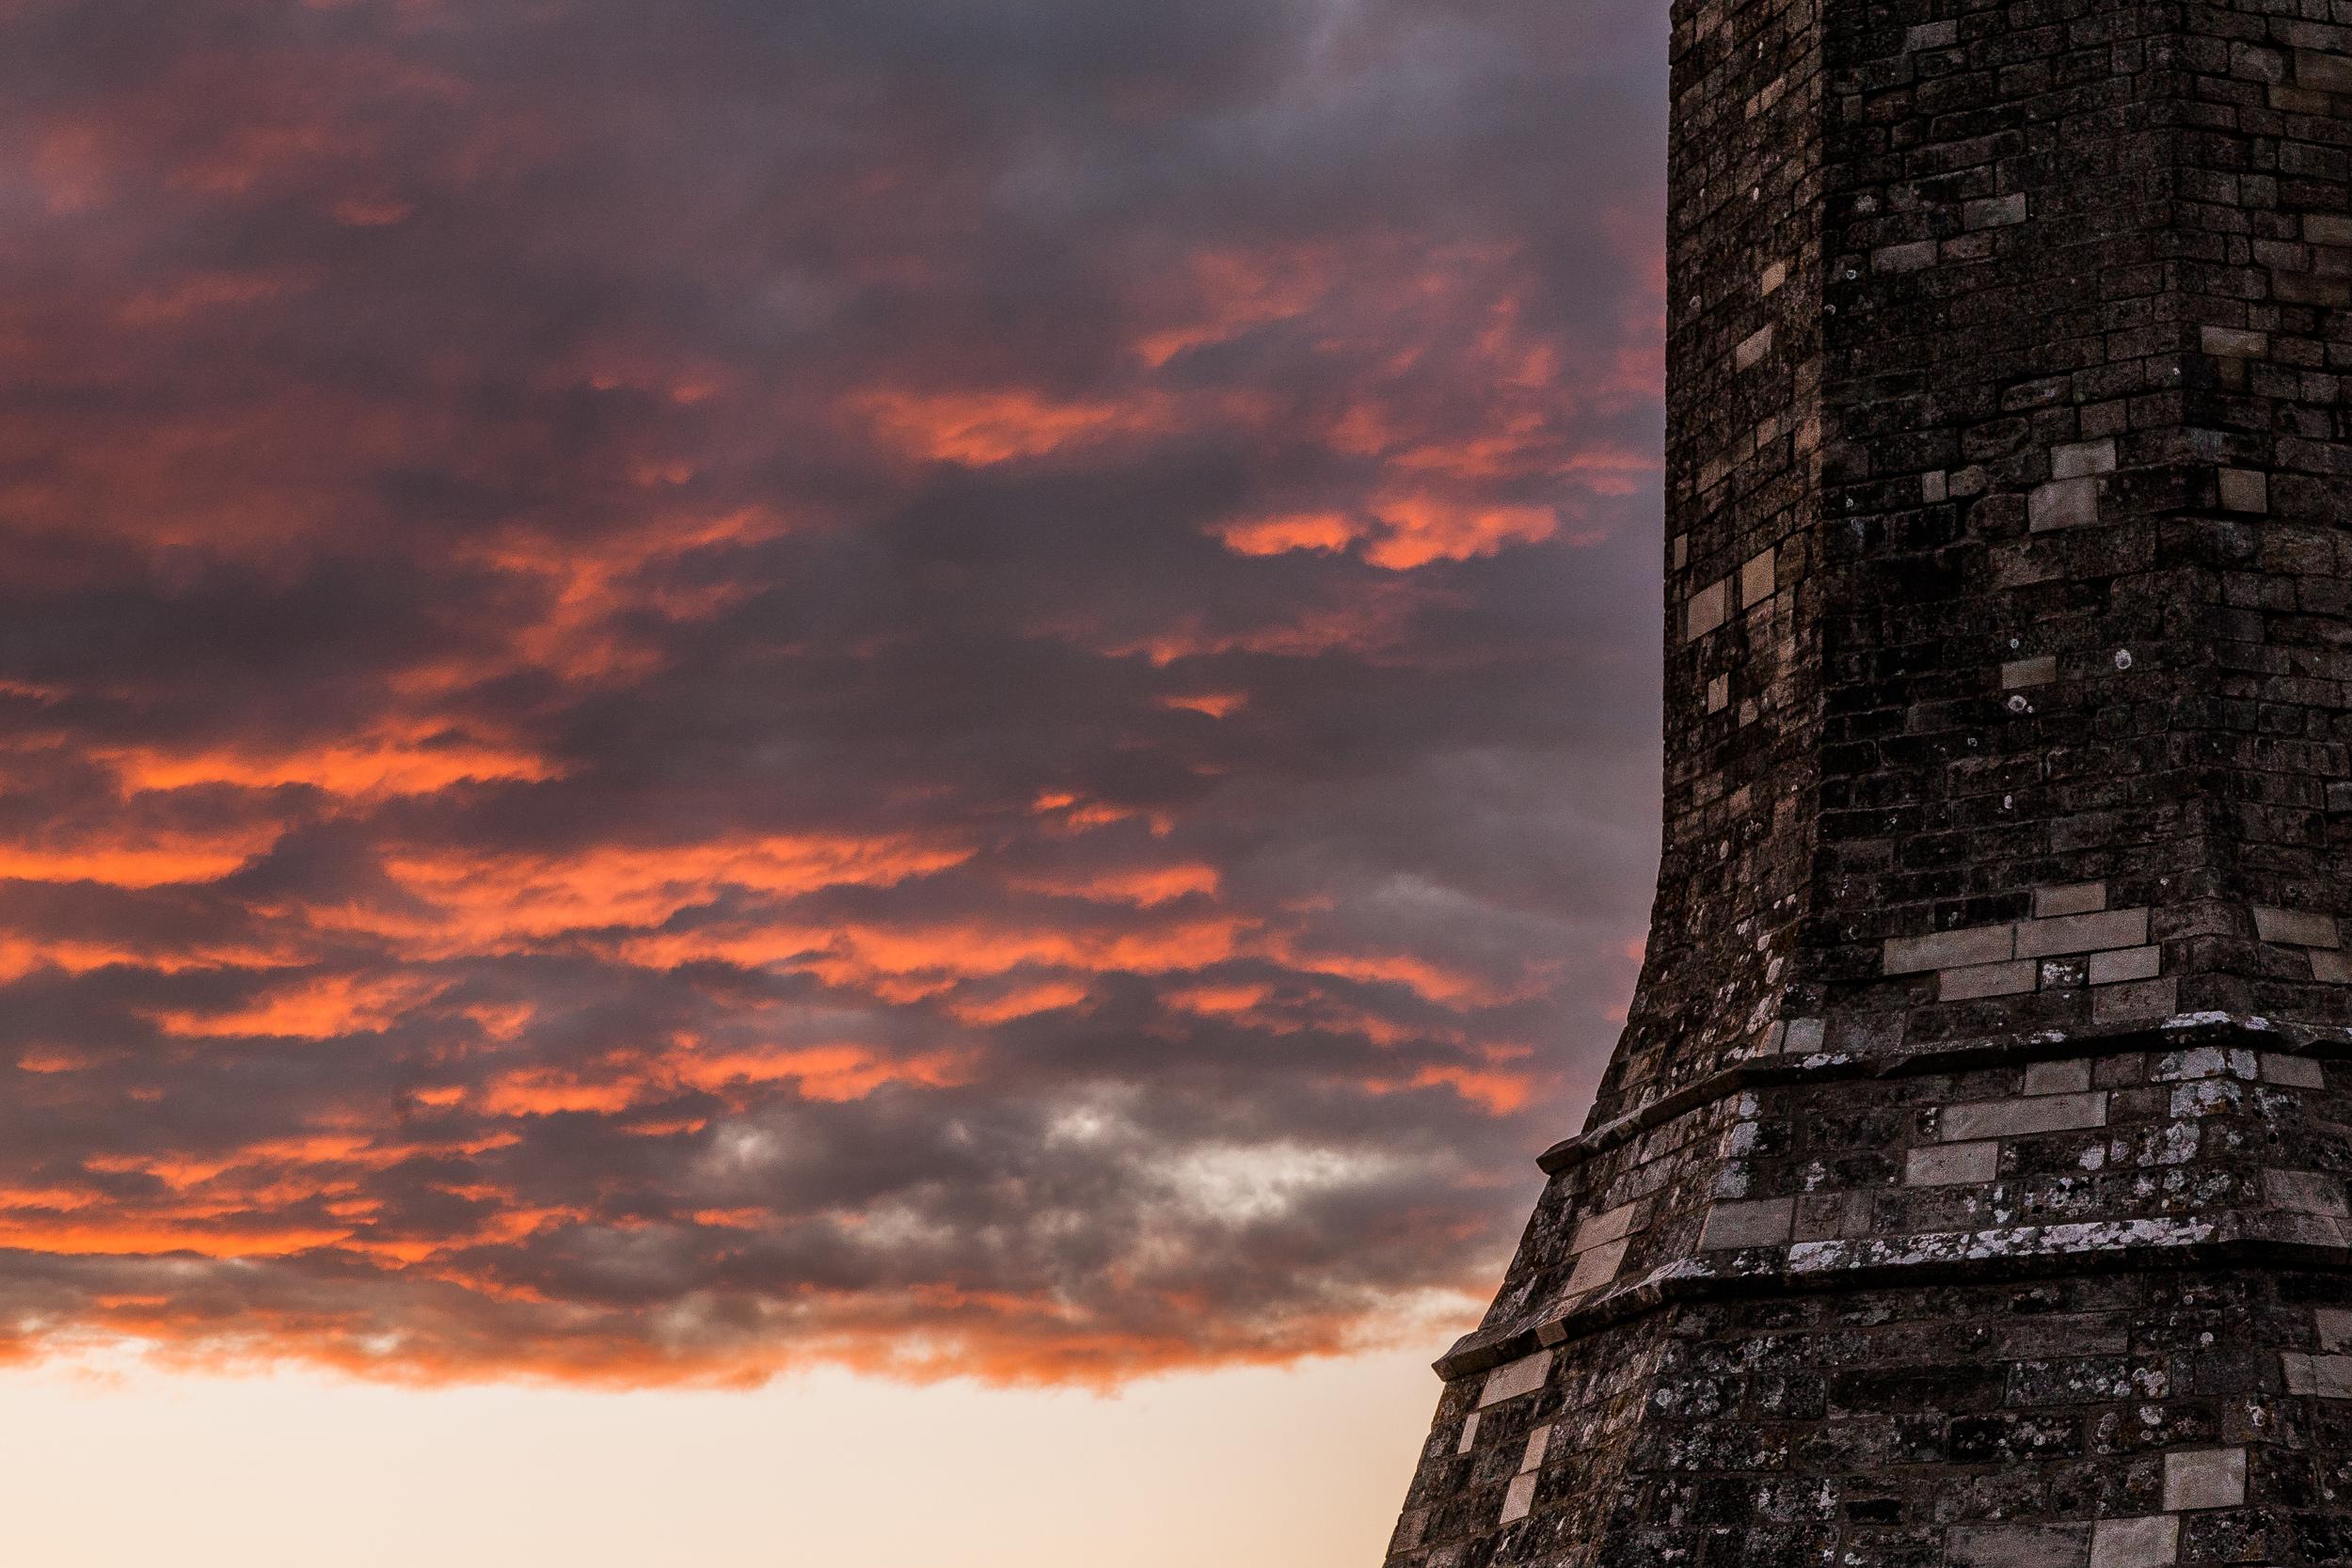 Hardy Monument by Dorset Photographer Rick mcevoy